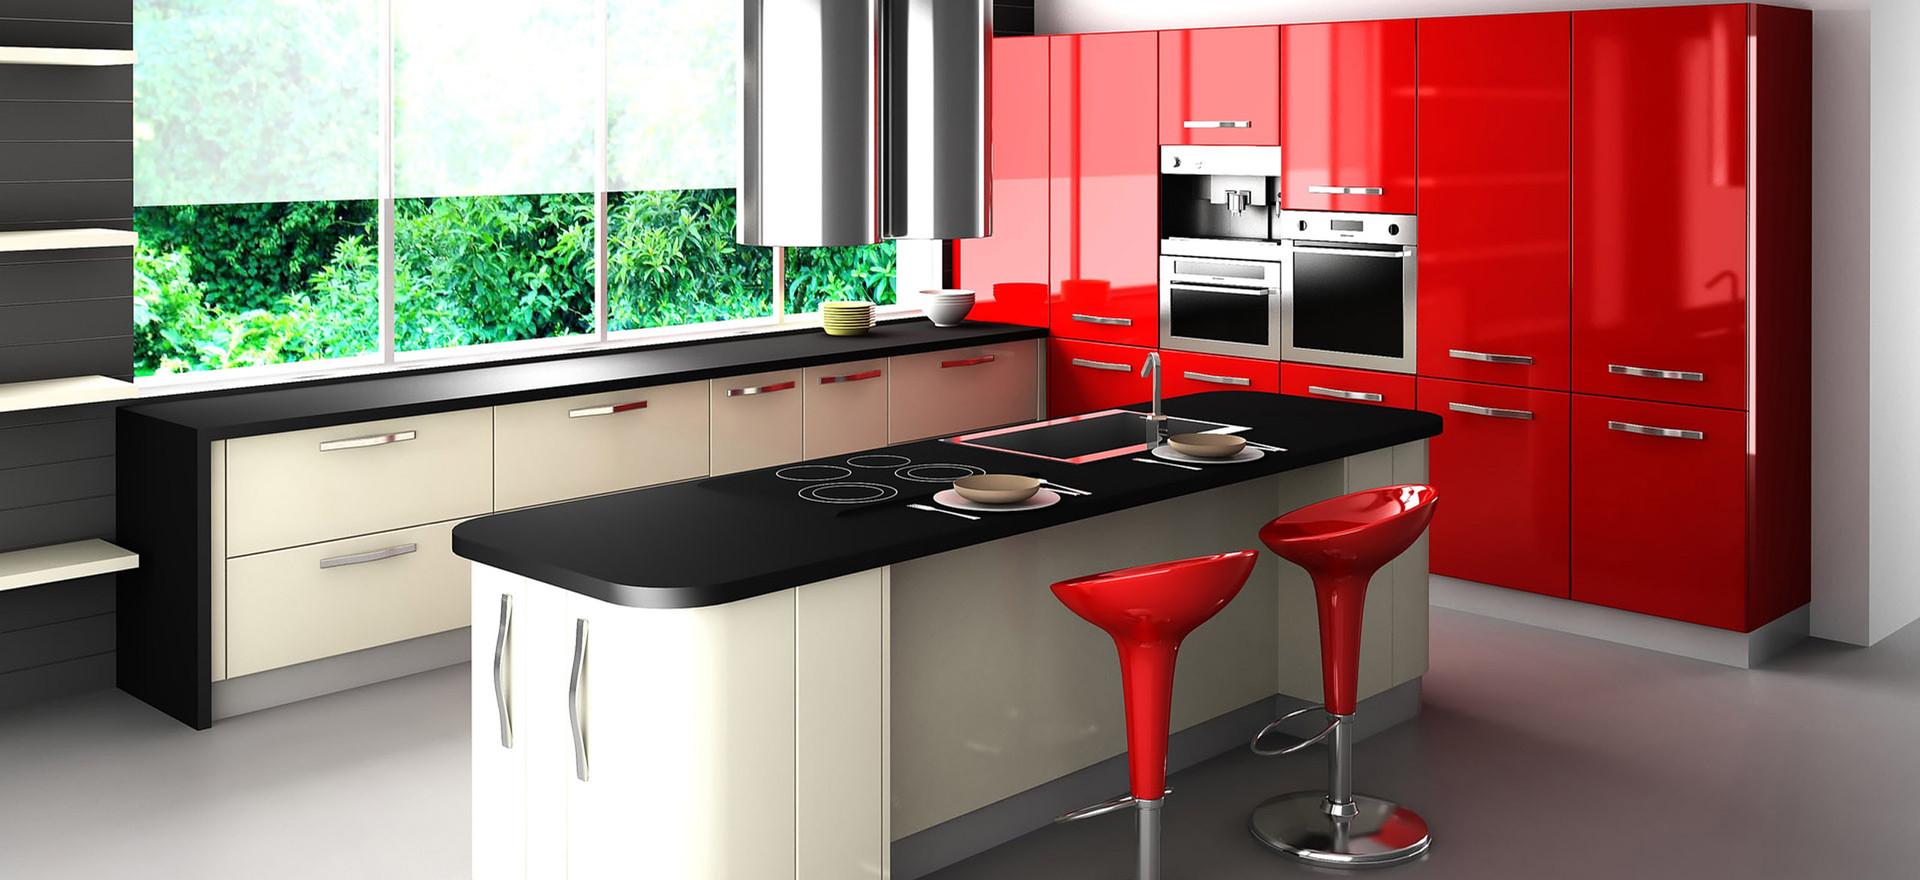 Fantastic-Modern-Kitchen-Design-Red-Cabi